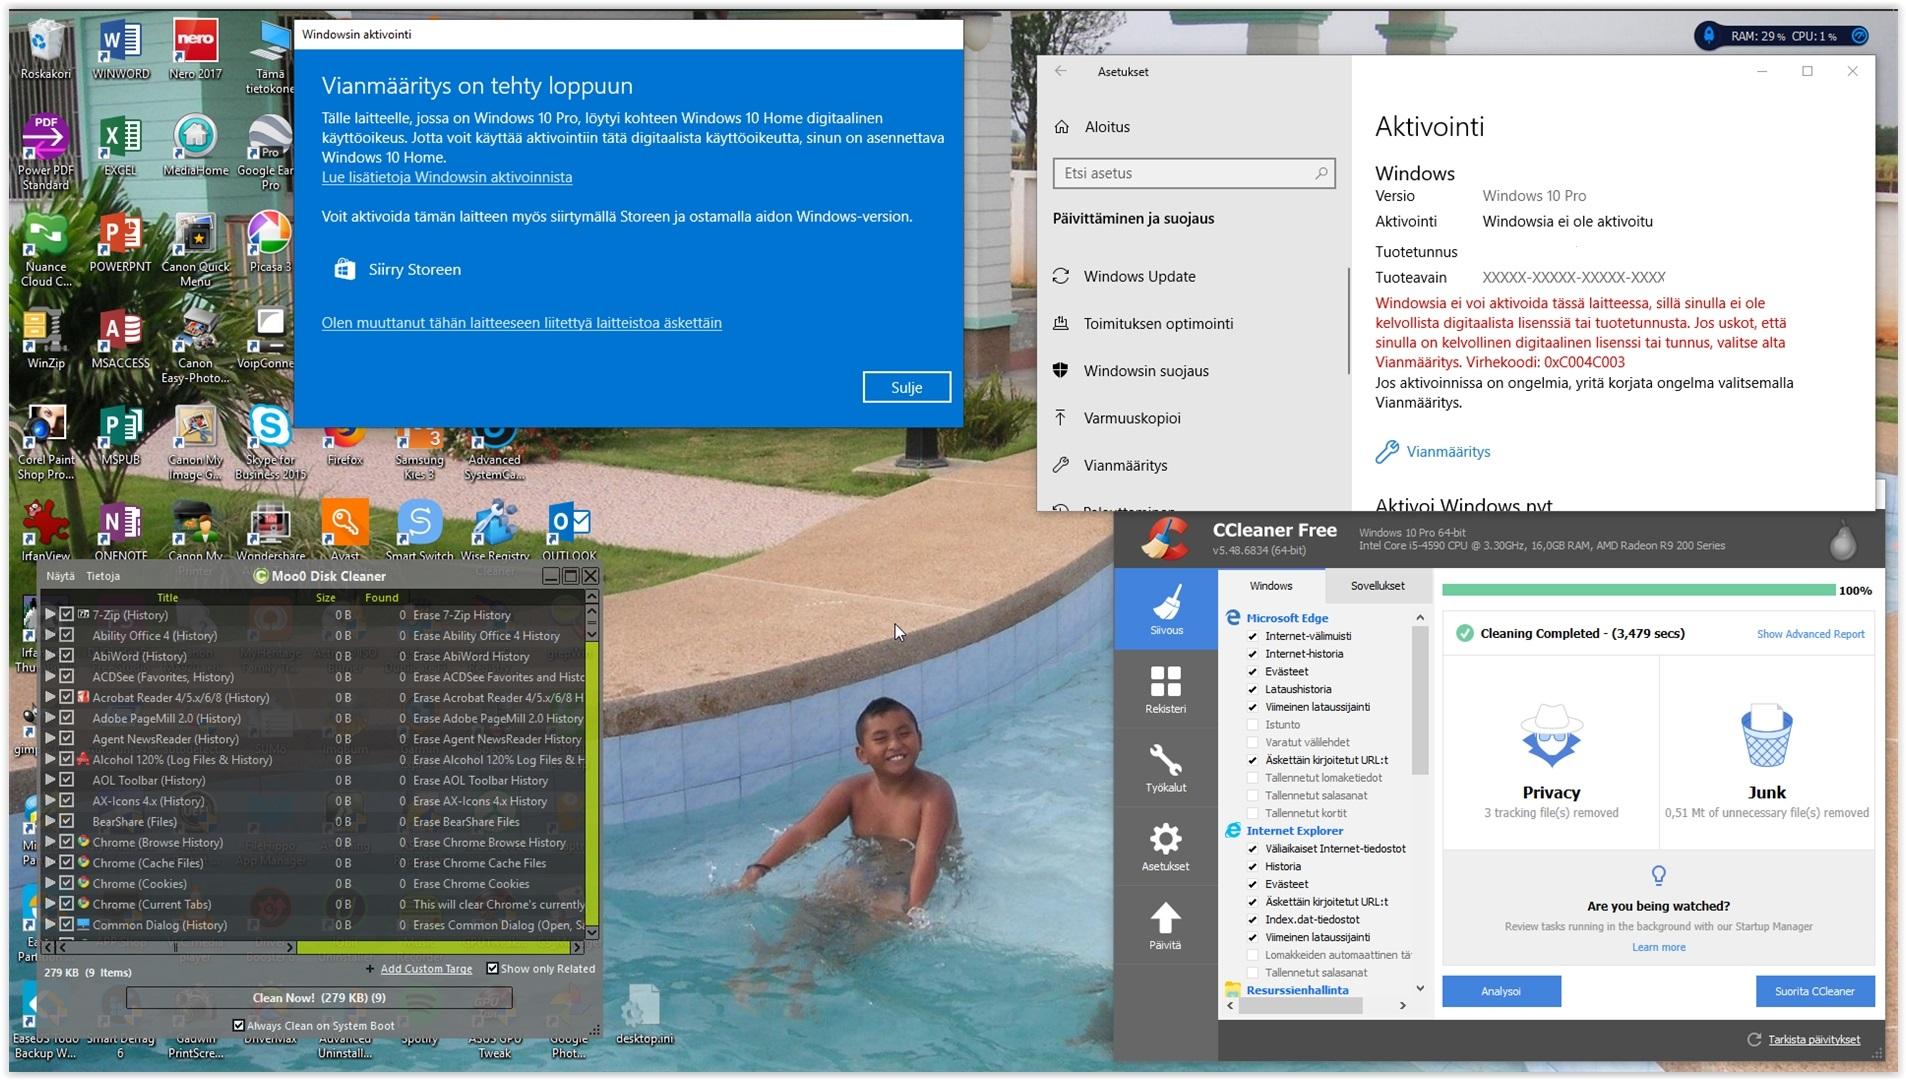 Screen Shot 11-08-18 at 07.19 PM.JPG